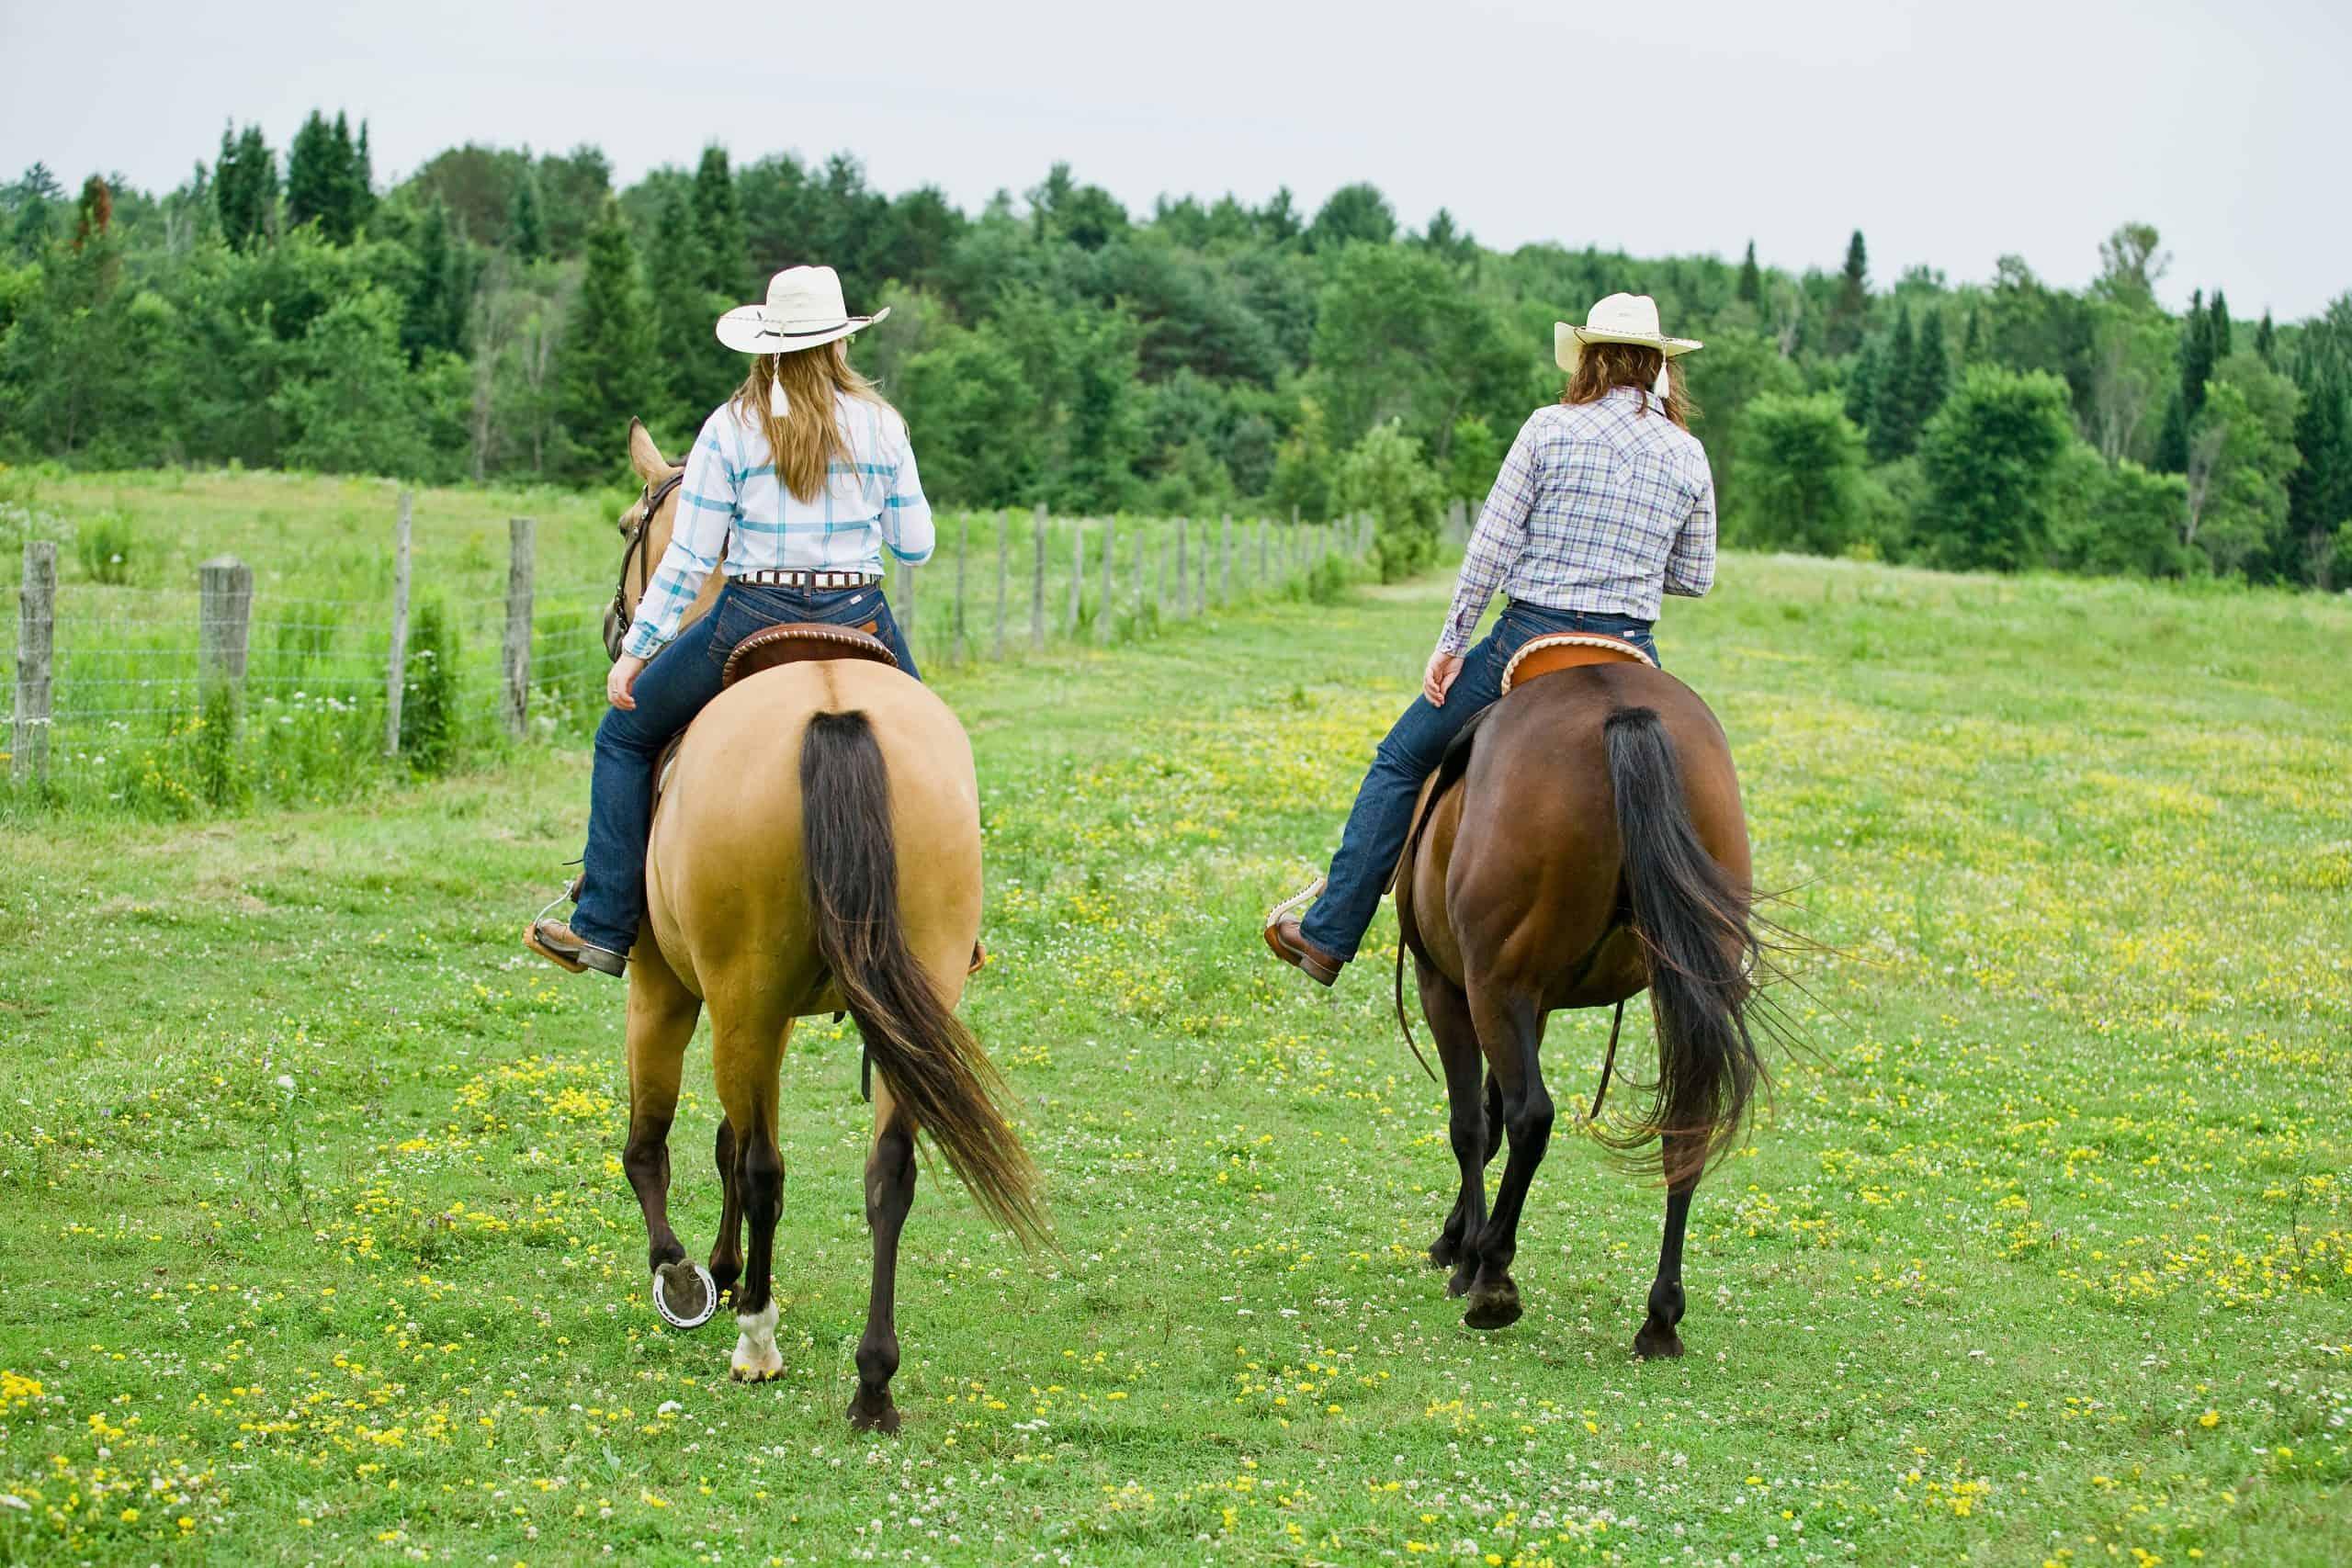 Two women riding horseback